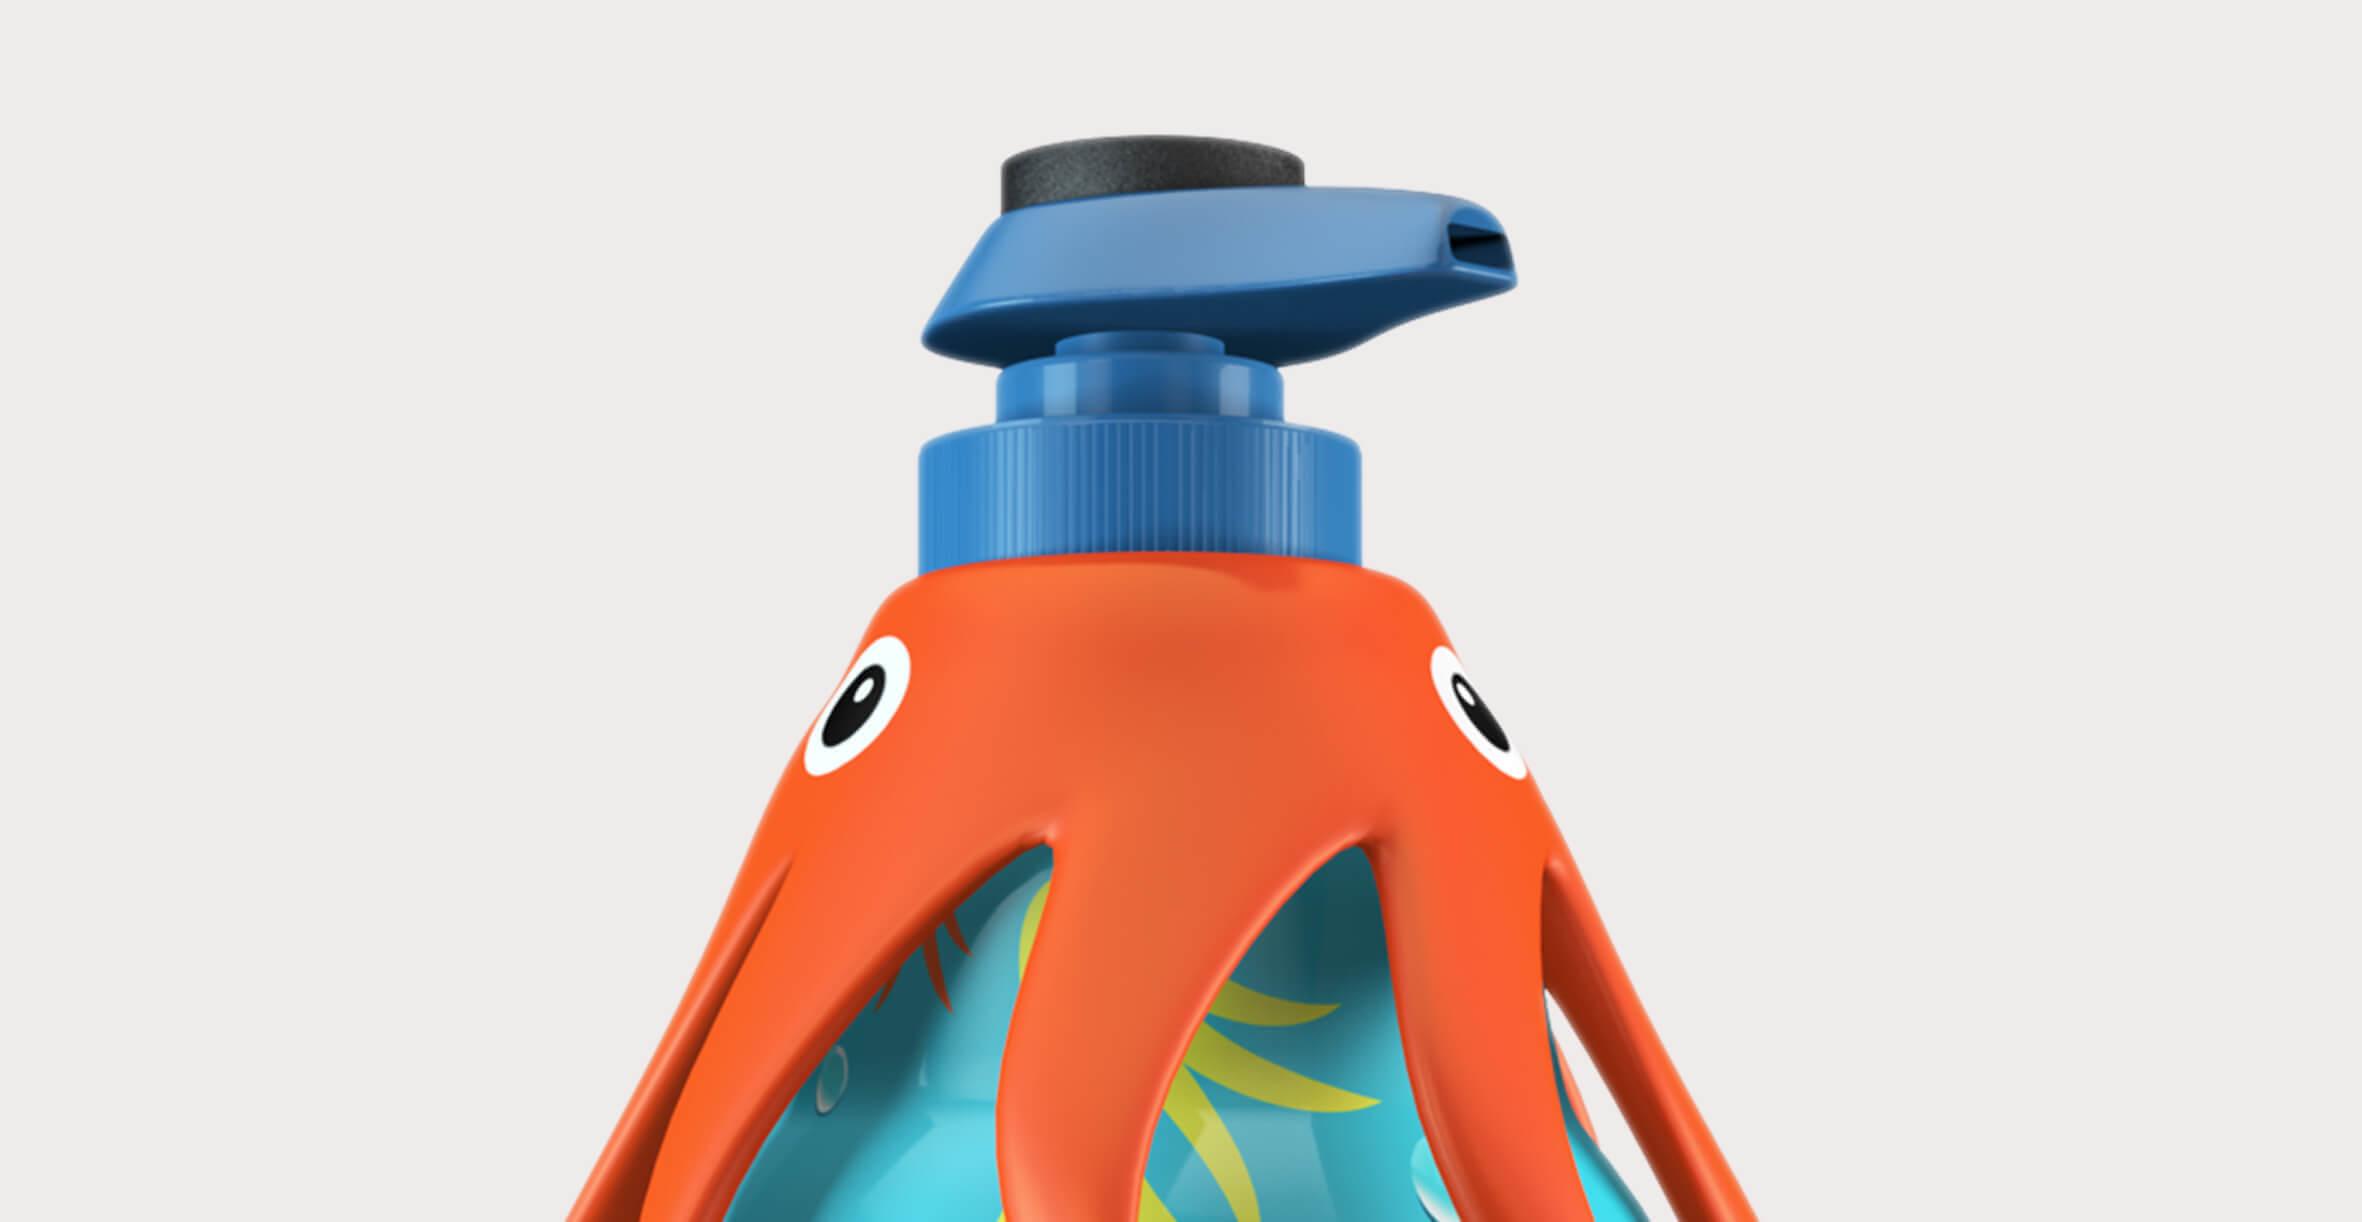 SquidSoap fun hand soap 3d render visual